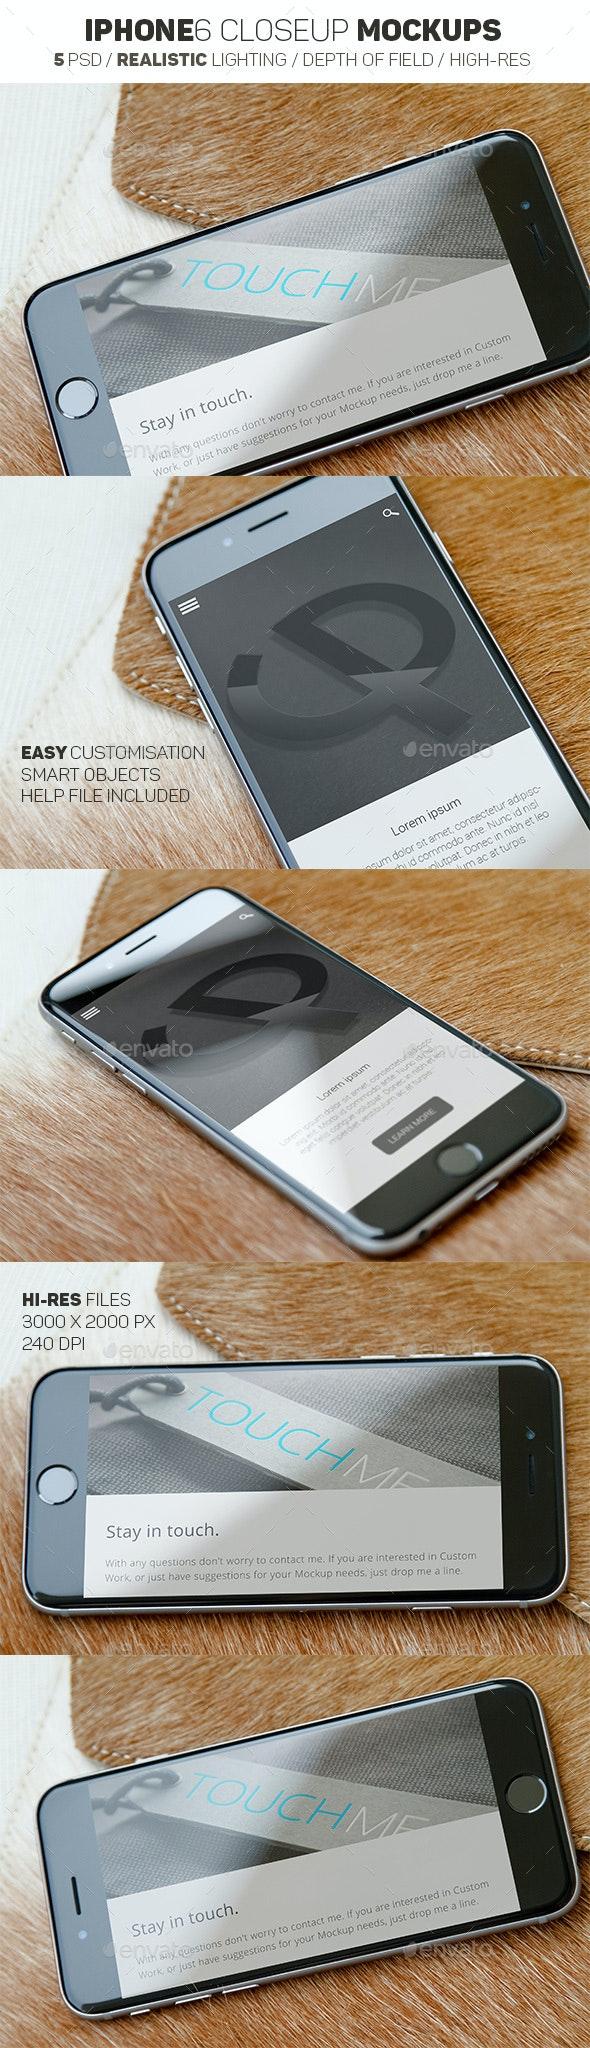 iPhone 6 Mockups Leather - Mobile Displays